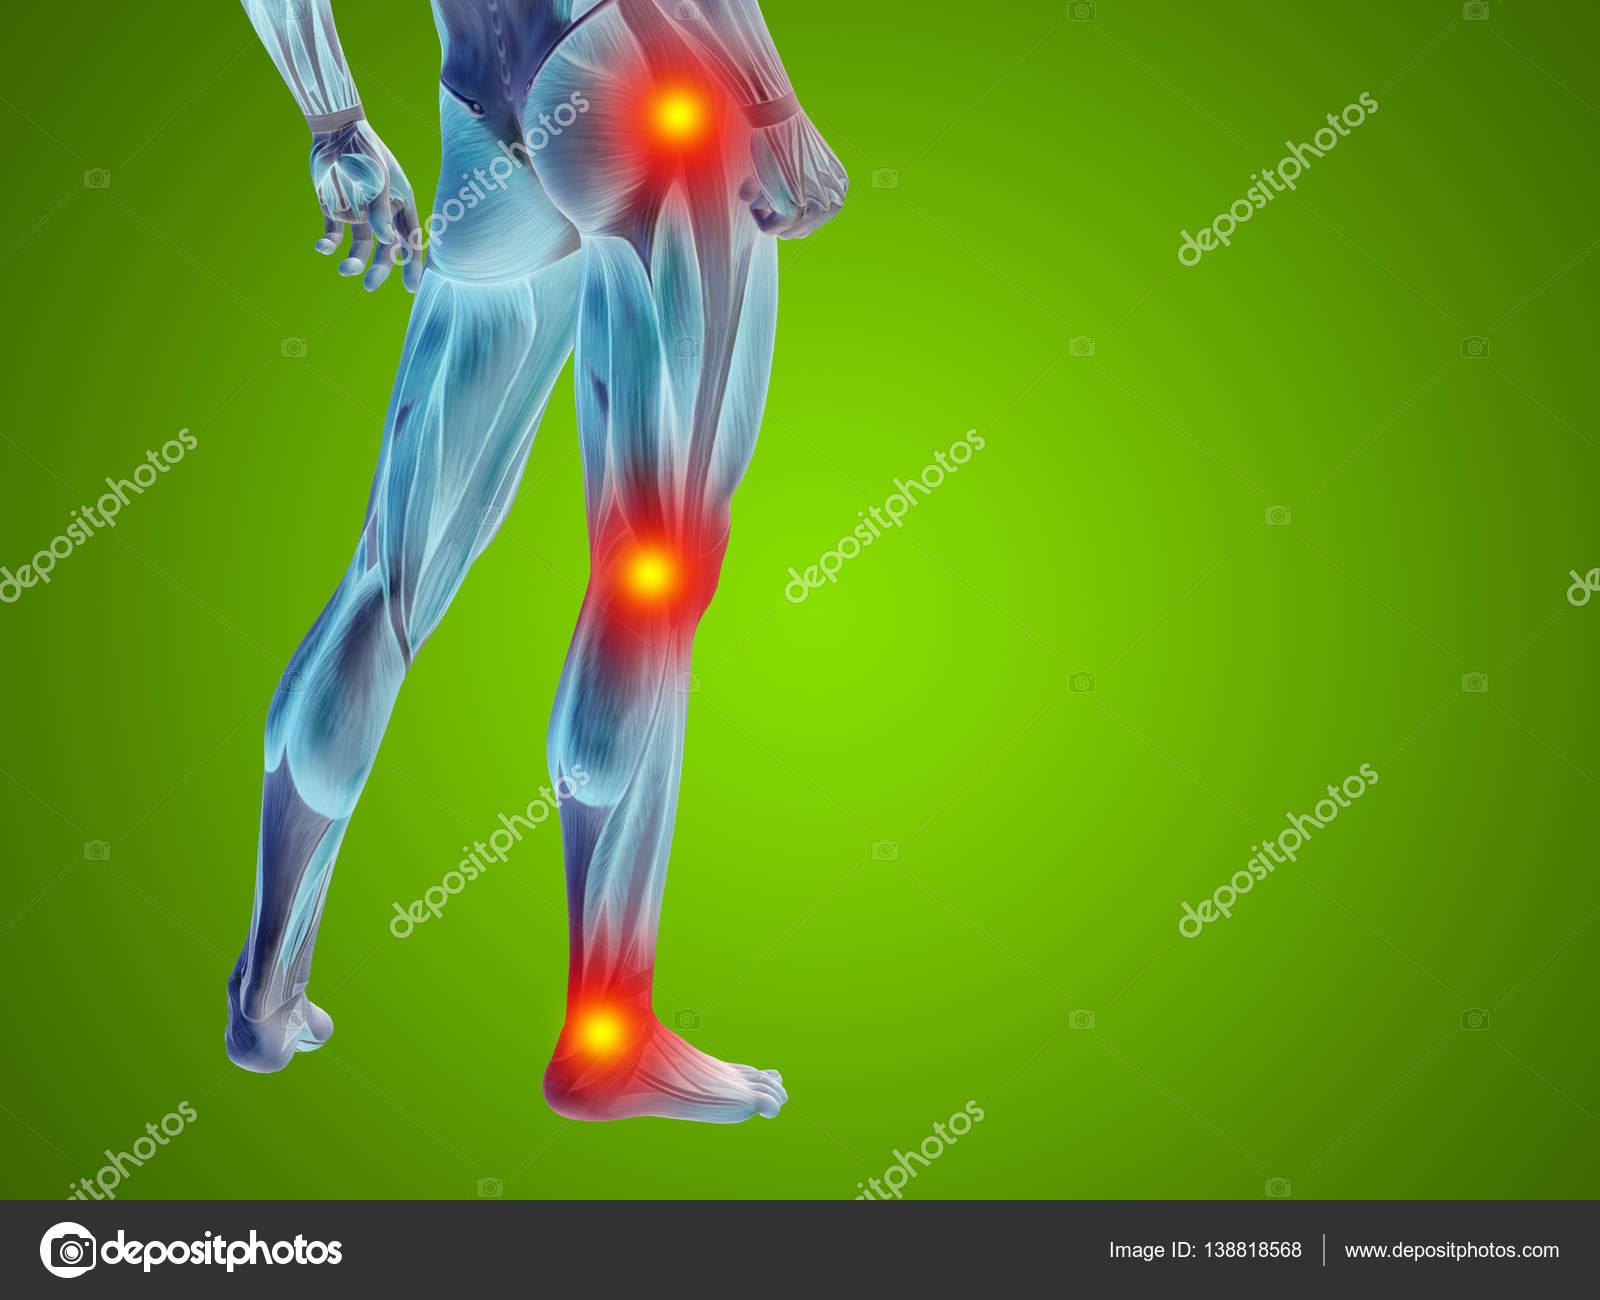 Human Lower Body Anatomy Stock Photo Design36 138818568